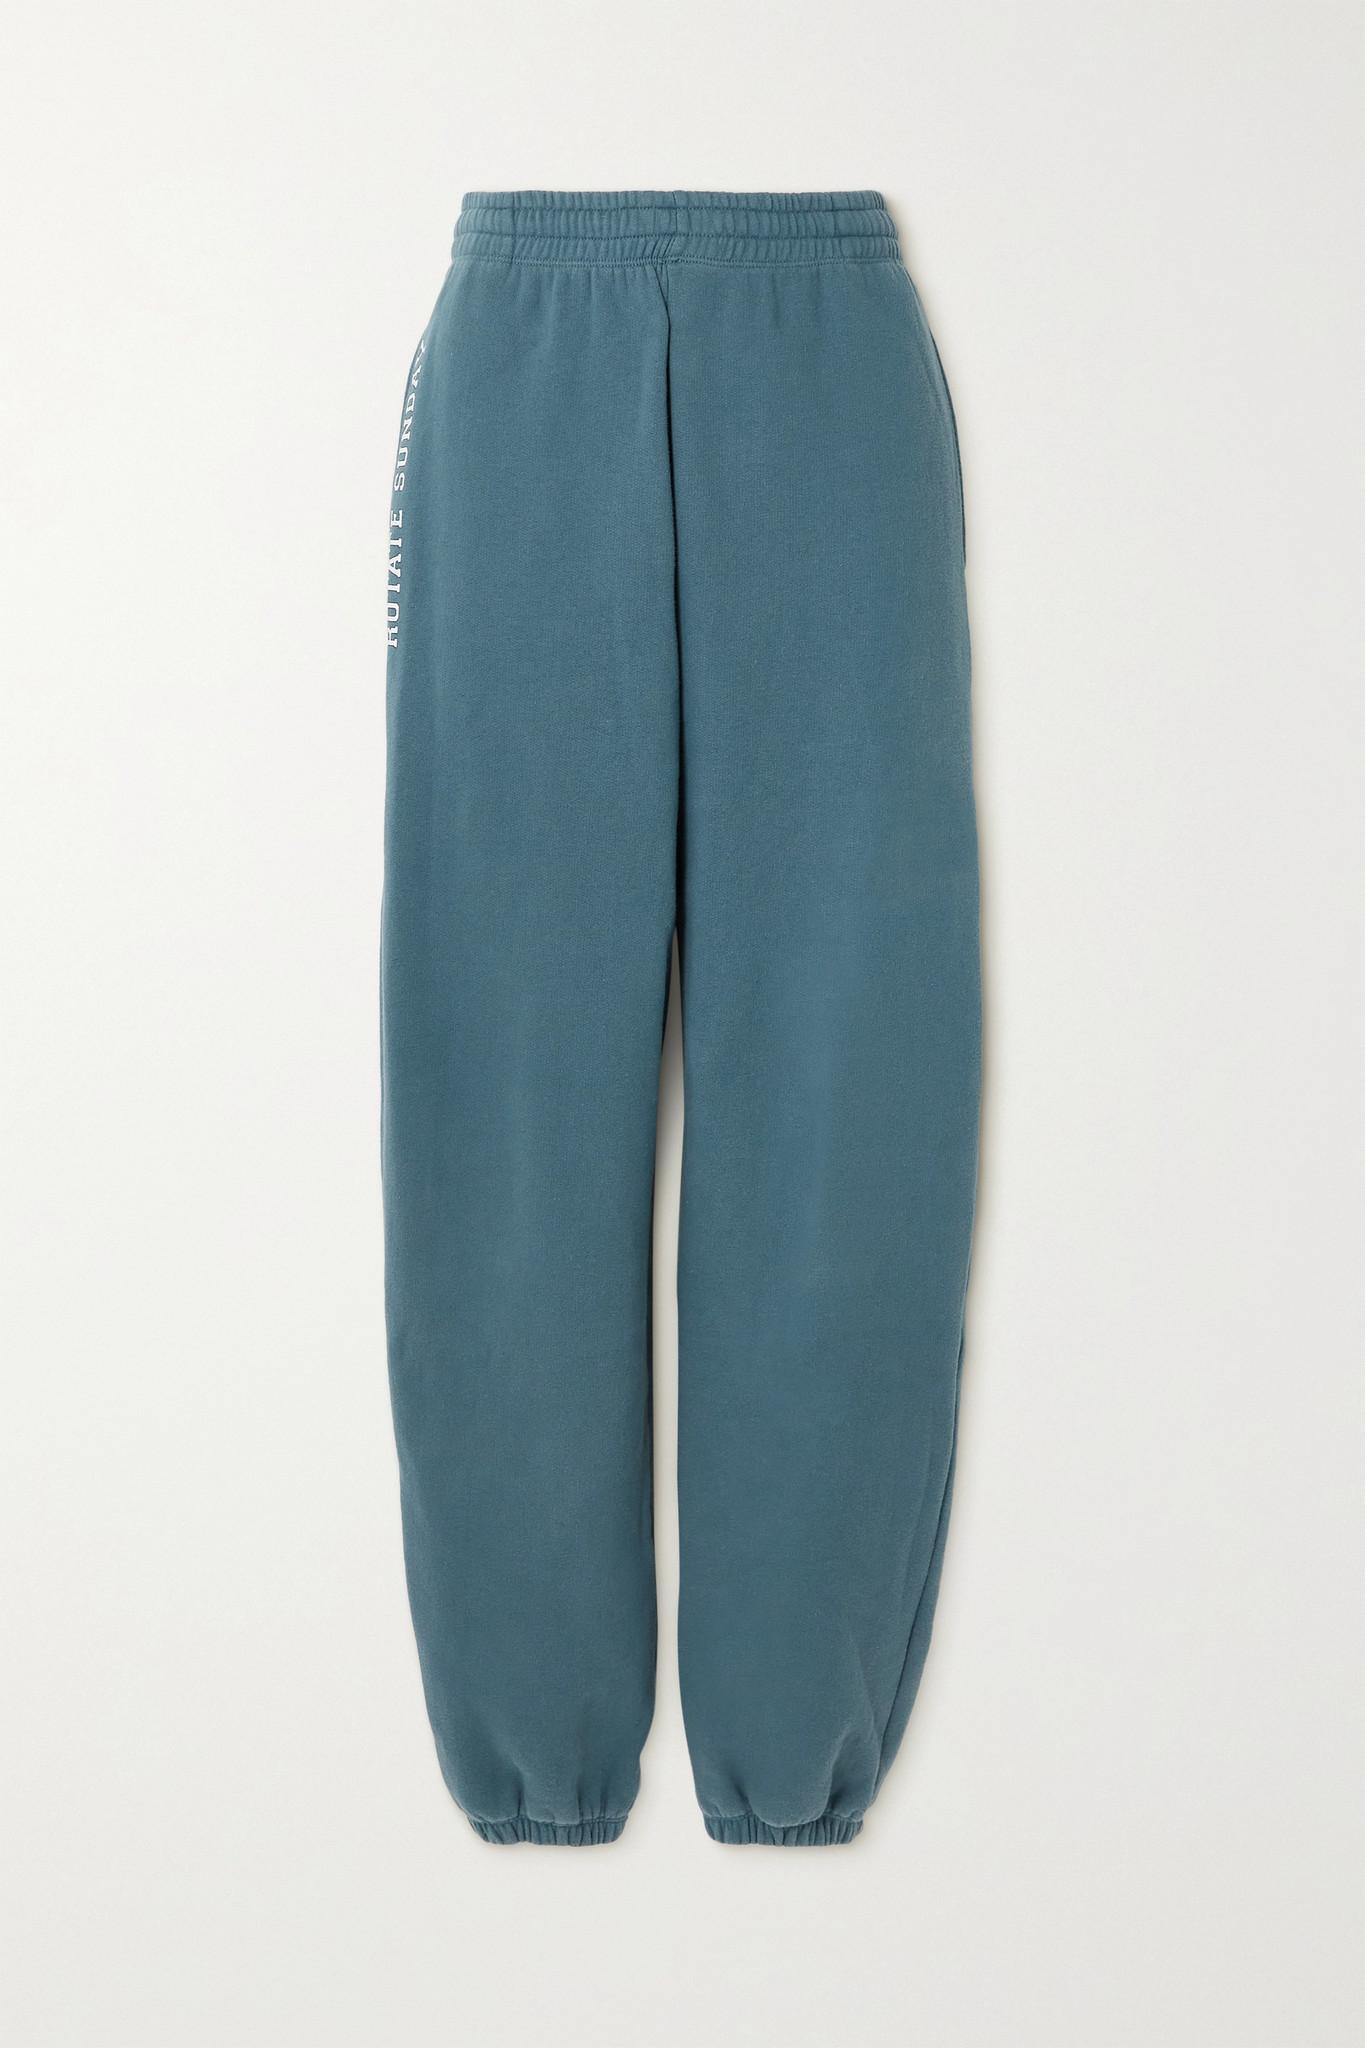 ROTATE BIRGER CHRISTENSEN - 【net Sustain】sunday Mimi 印花有机纯棉平纹布休闲裤 - 蓝色 - medium